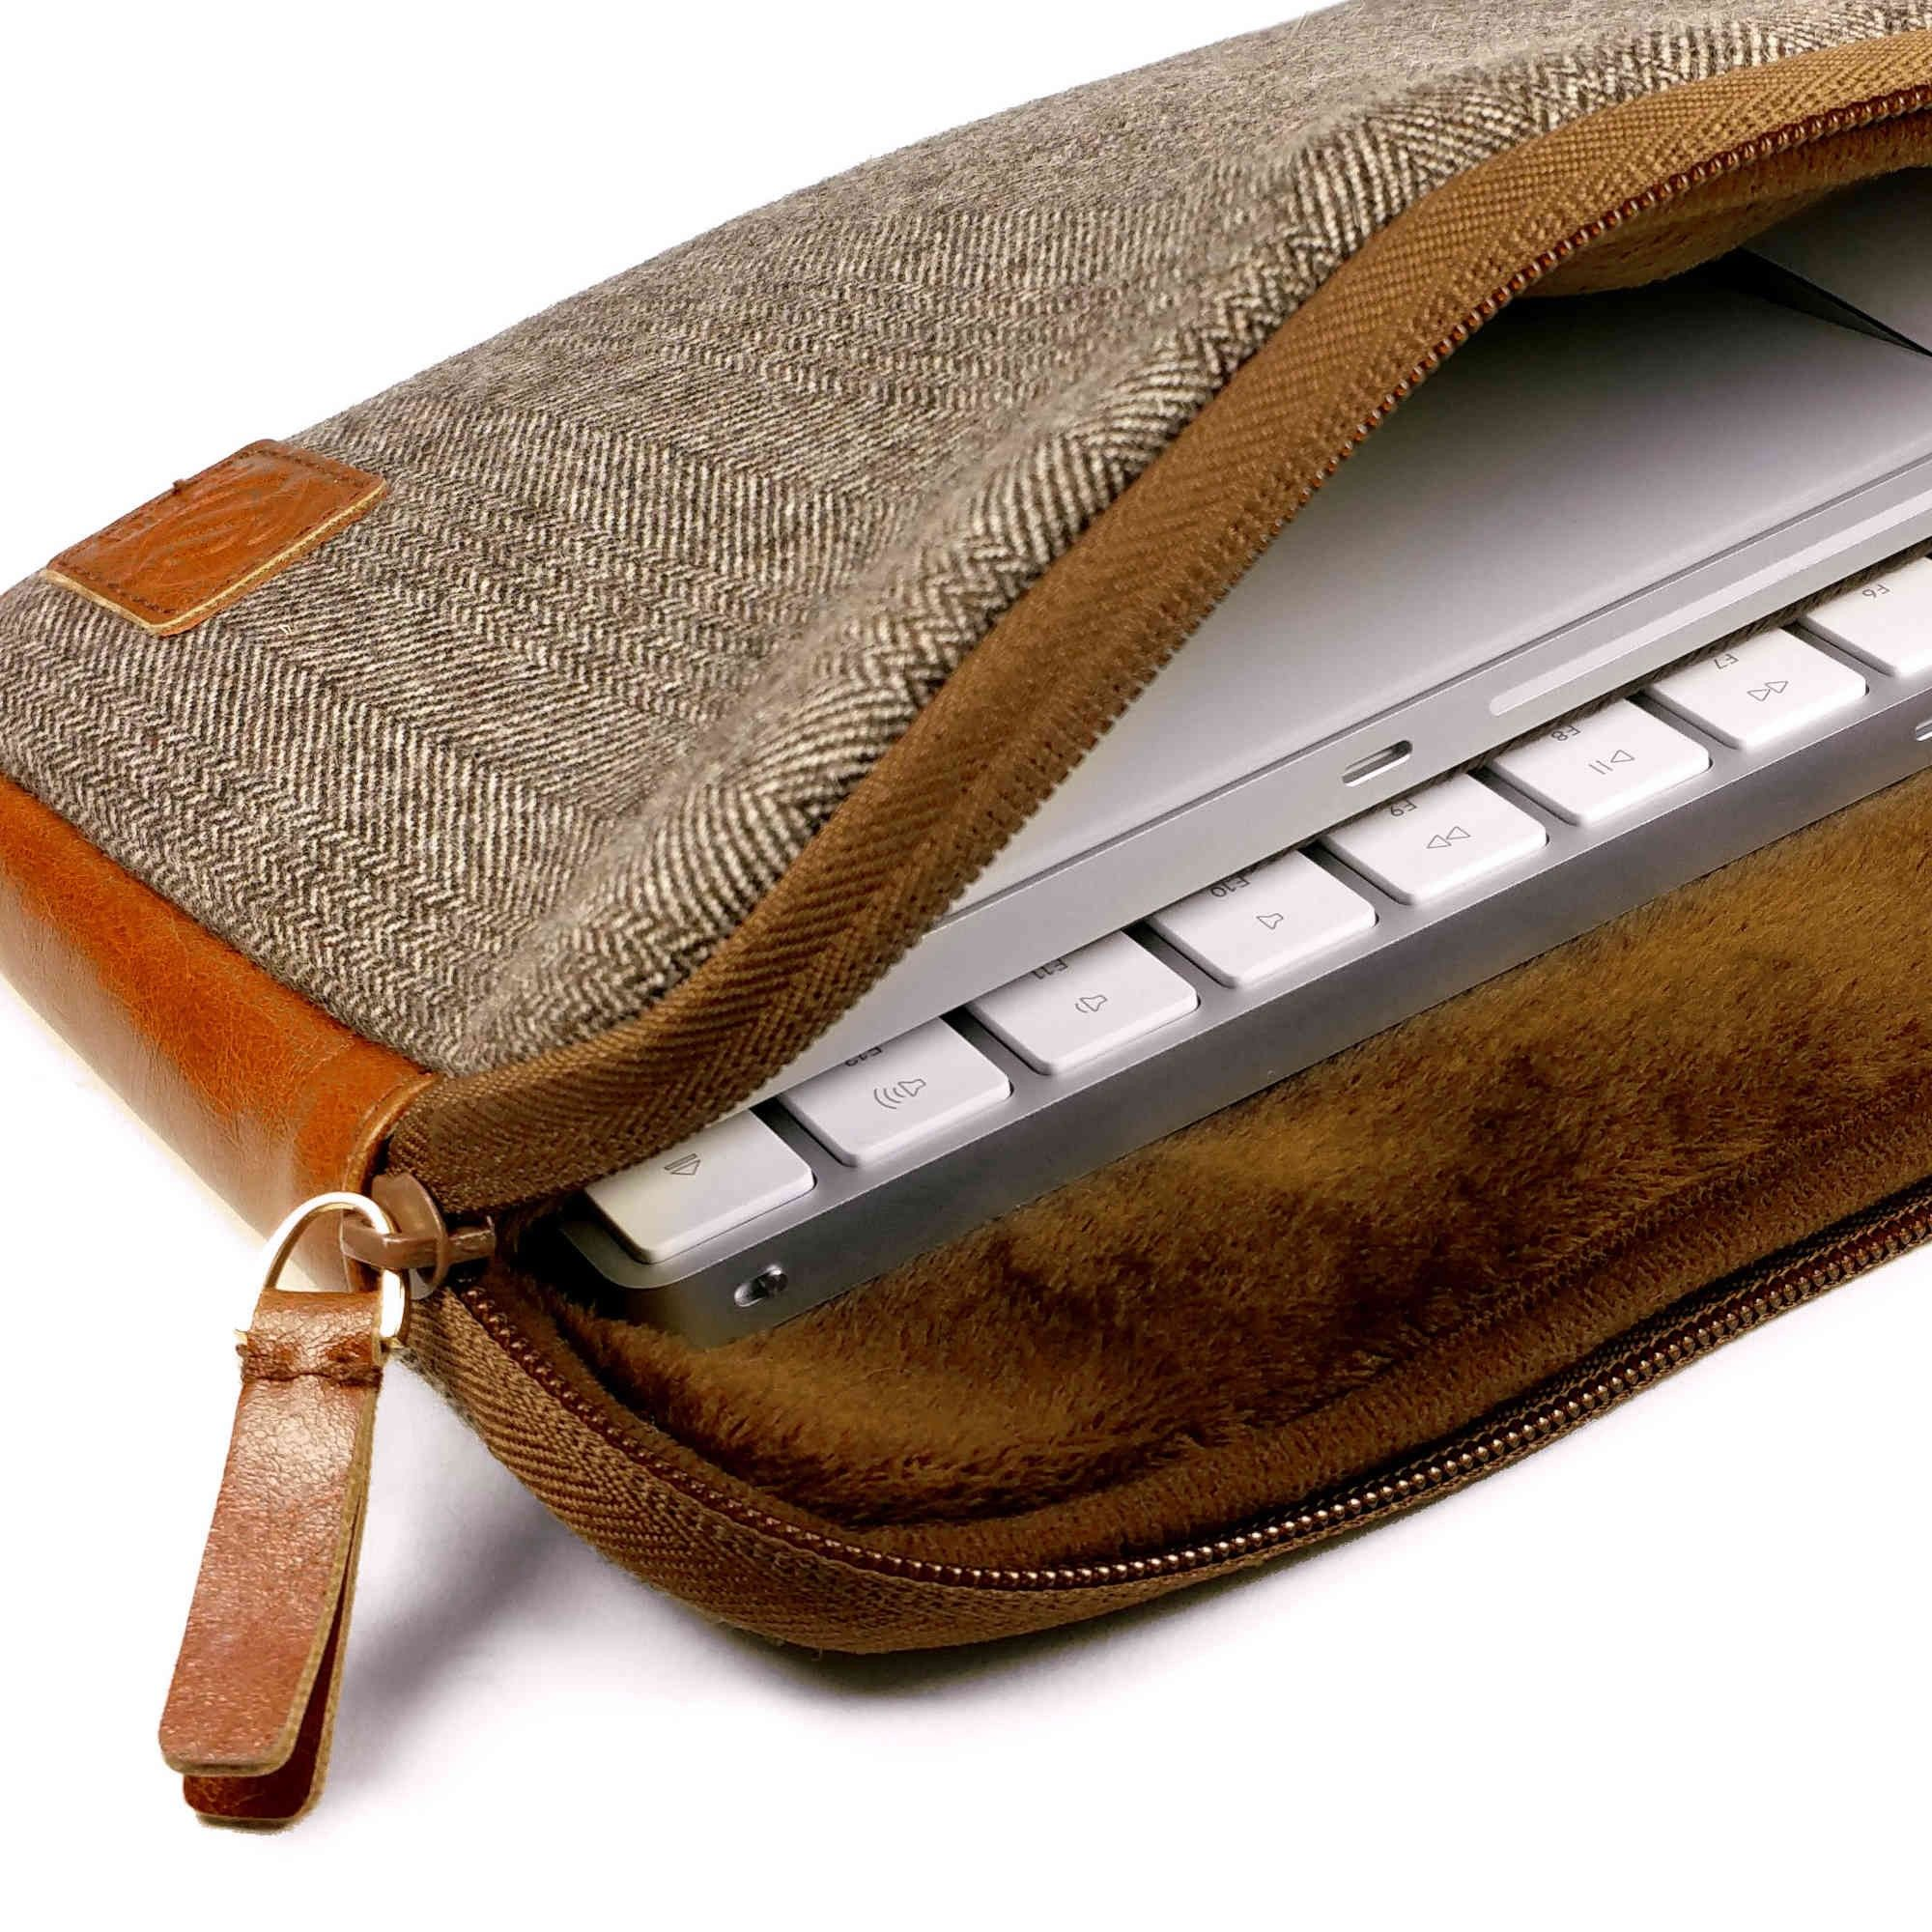 Herringbone Tweed funda de viajes para el enlace Apple Magic Keyboard 1 & 2  / Mouse